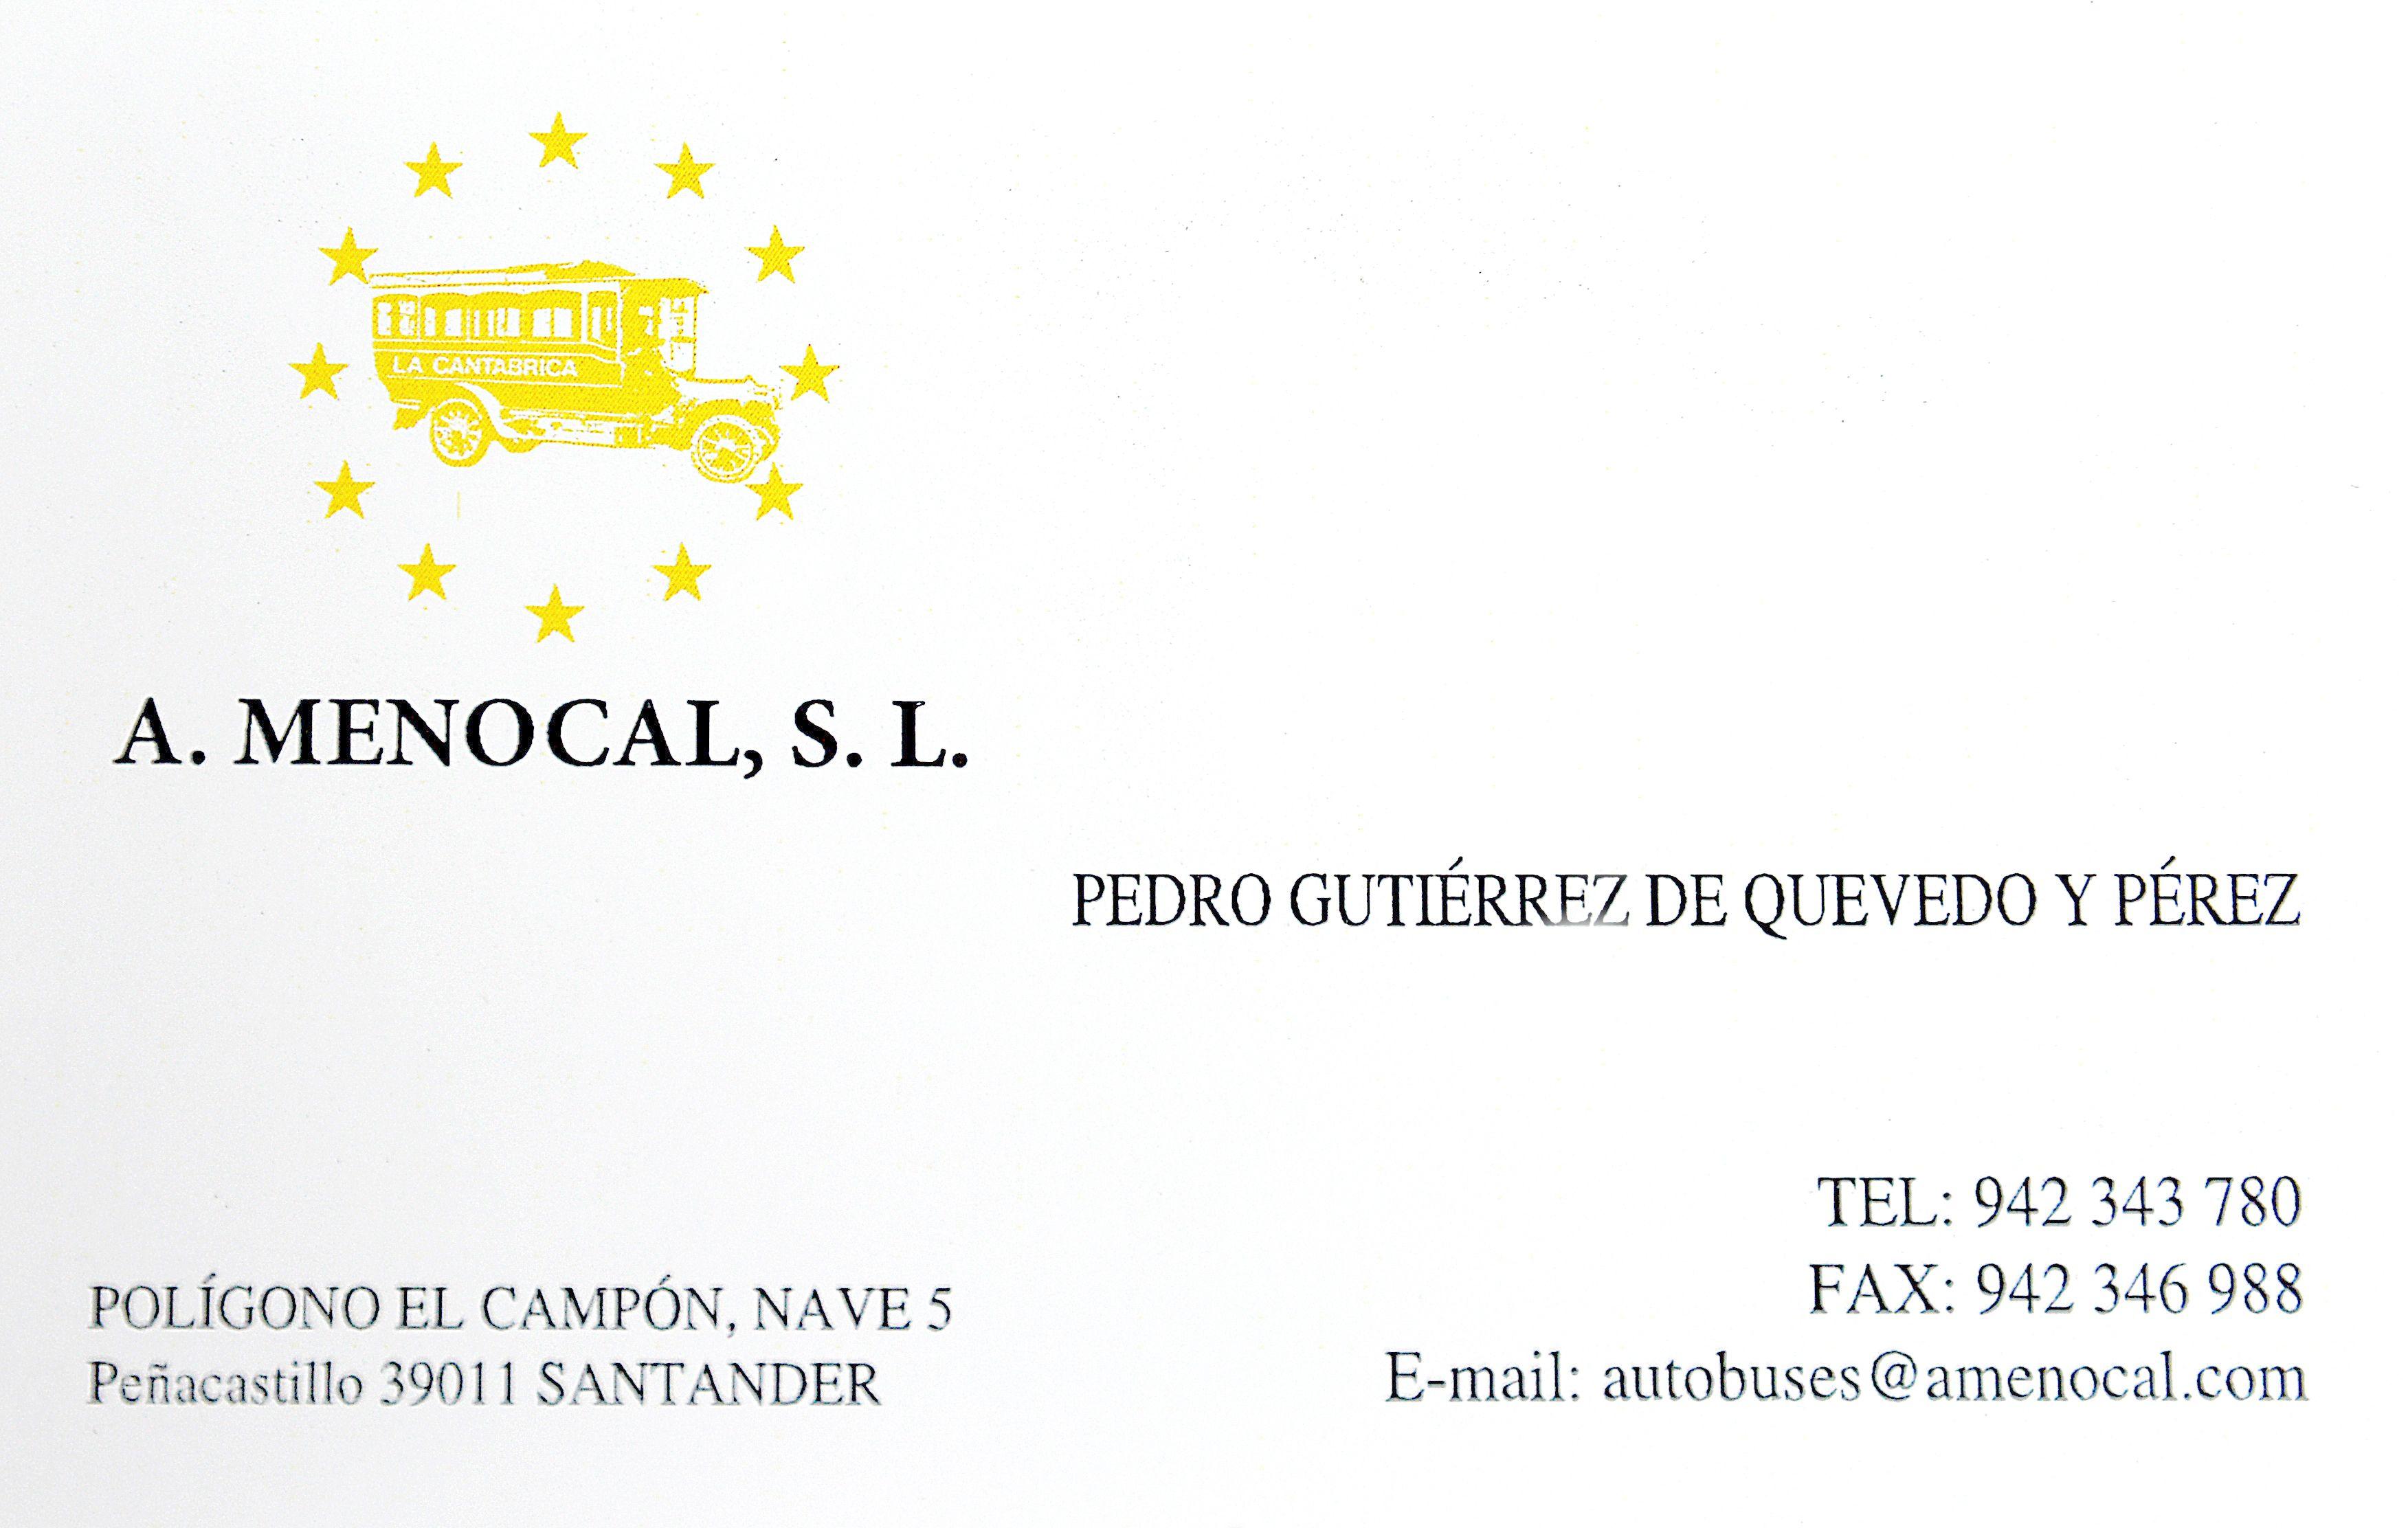 Foto 1 de Autocares en Peñacastillo - Santander   A. Menocal, S.L.